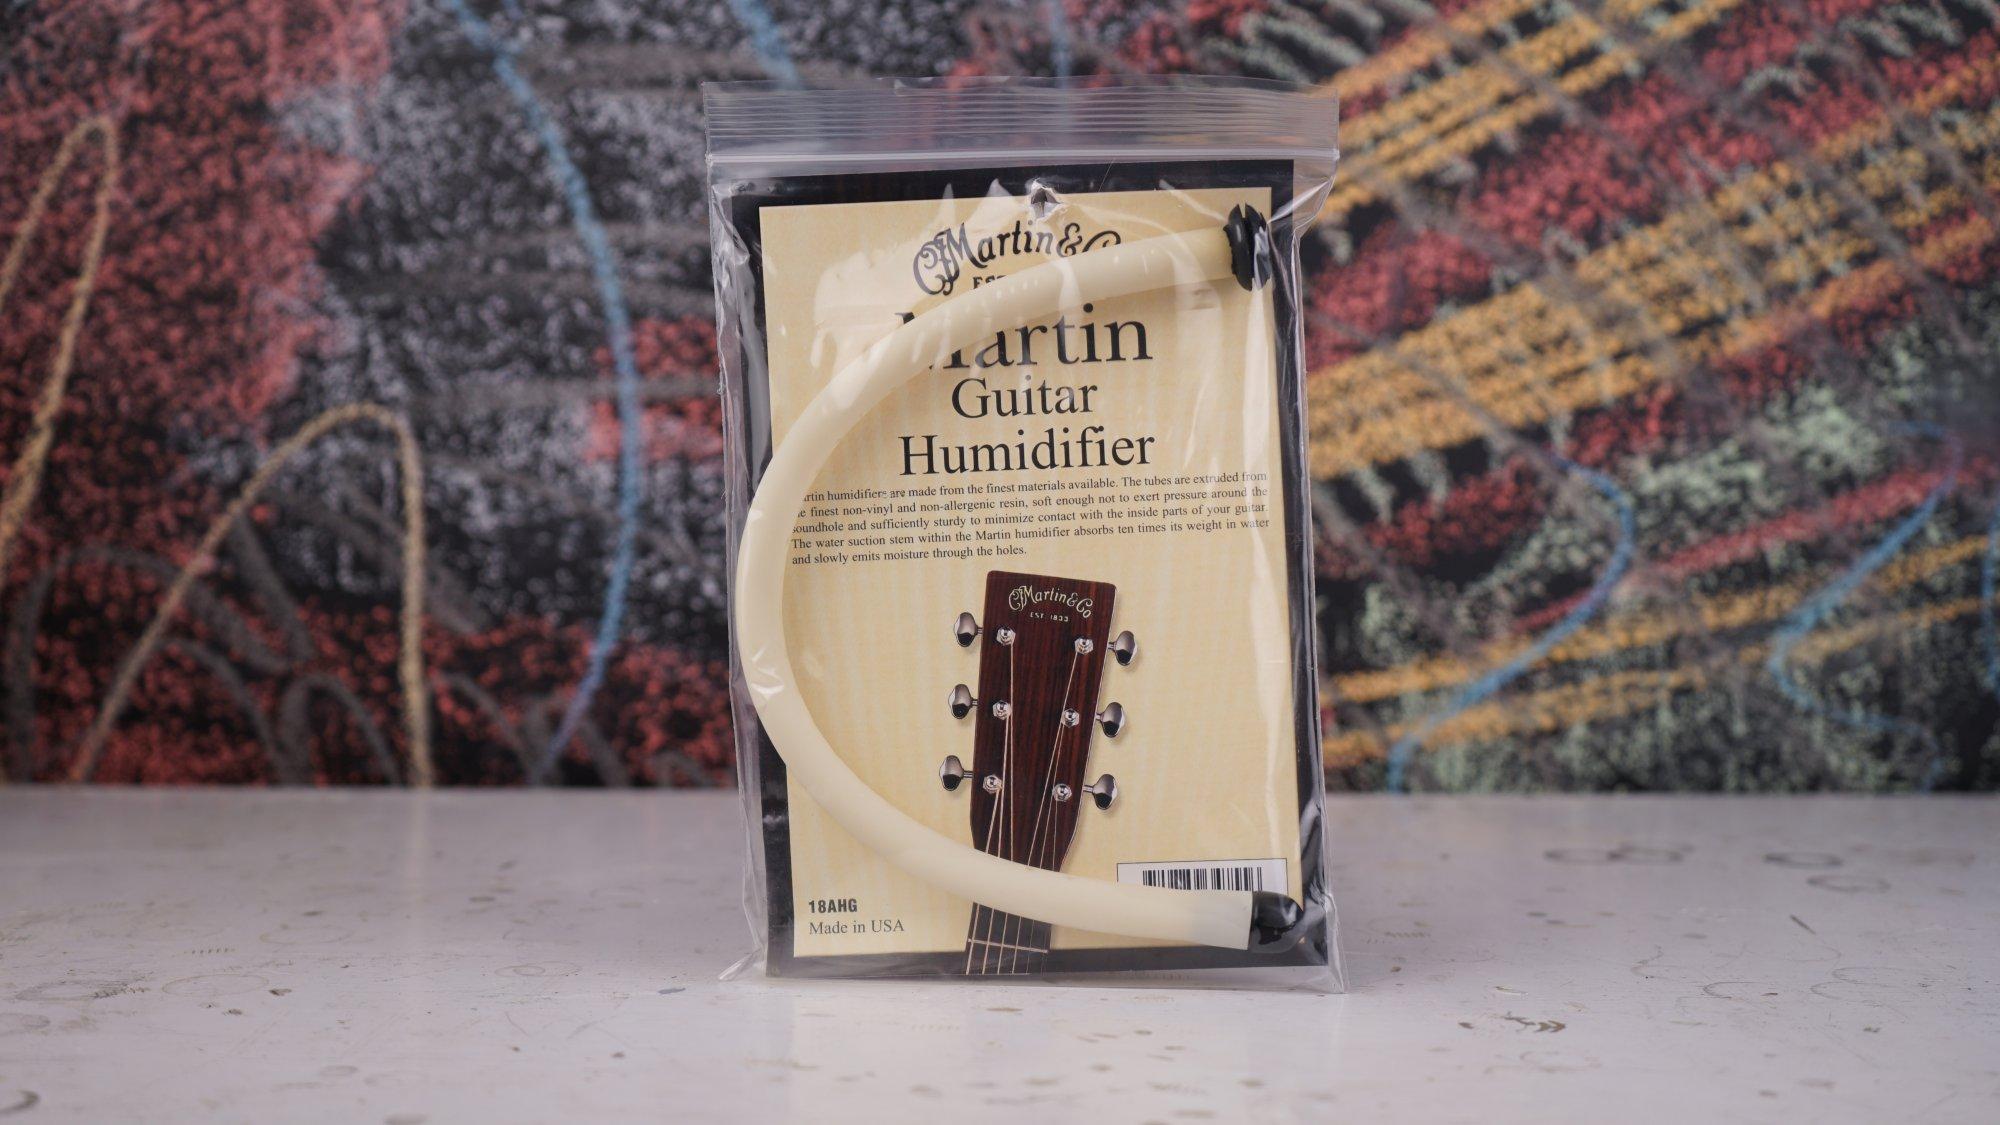 Martin Guitar Humidifier 18AHG